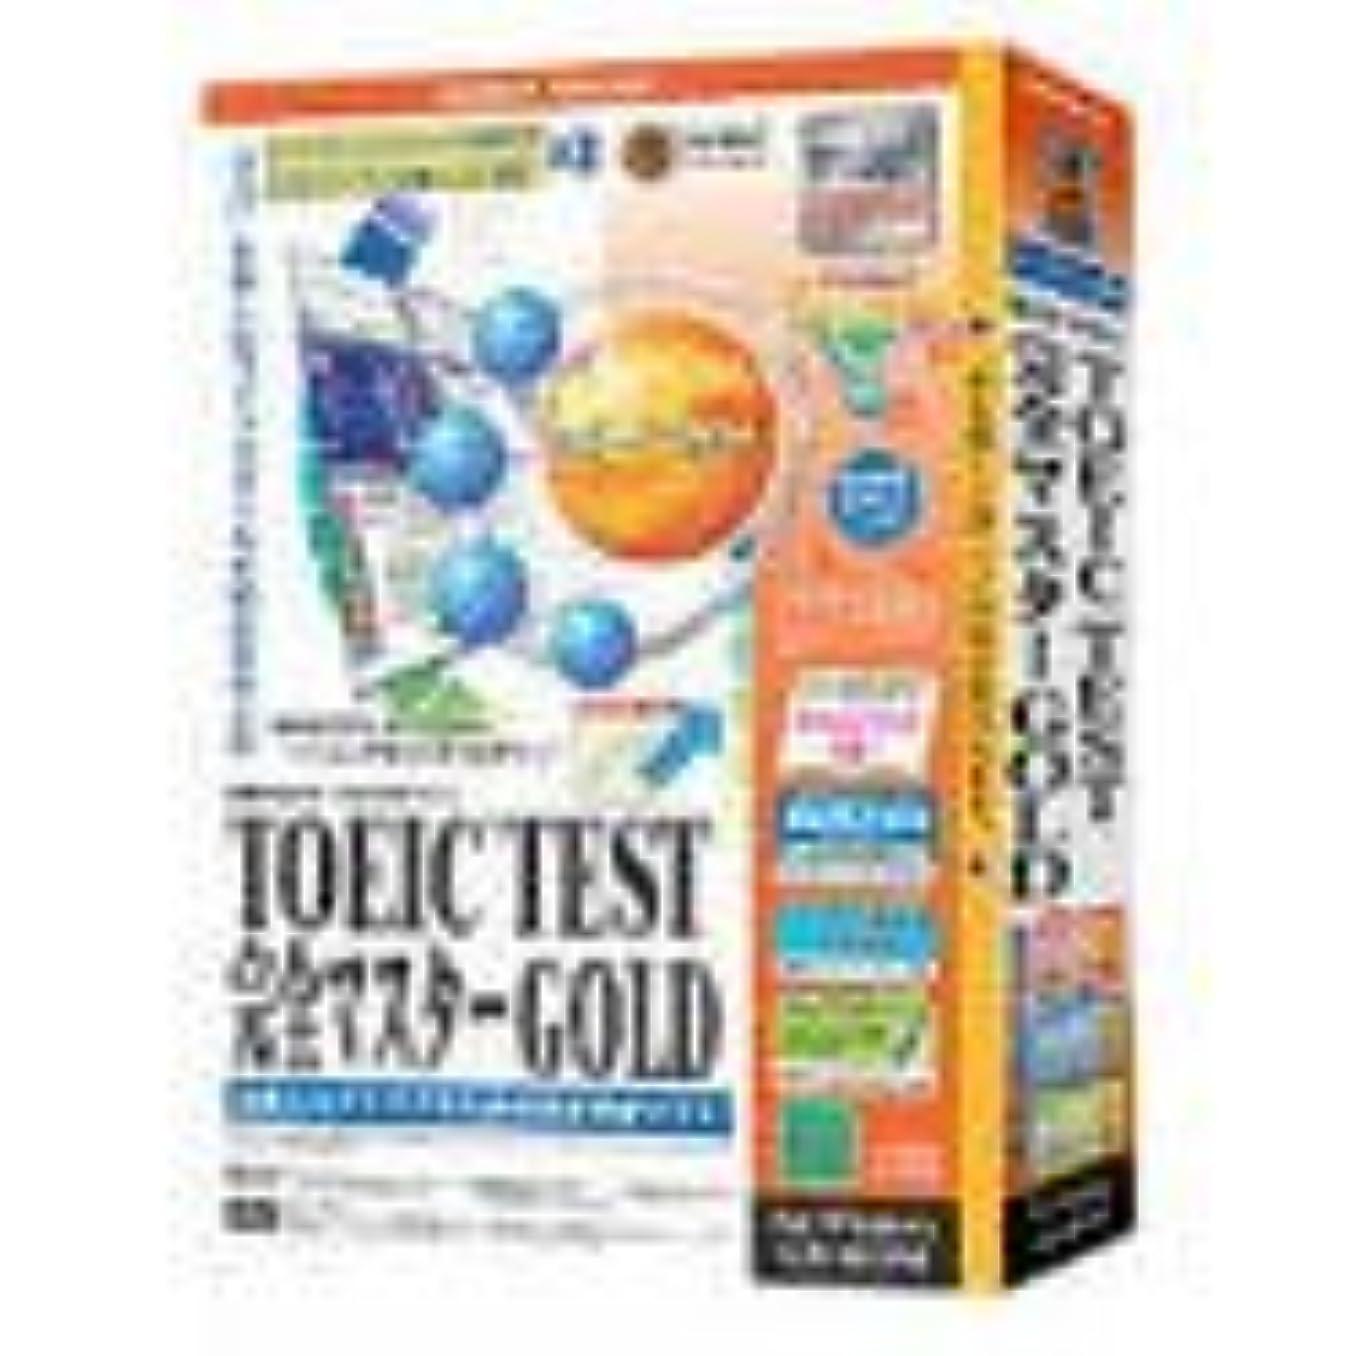 media5 Special Version 4 TOEIC Test 完全マスター GOLD